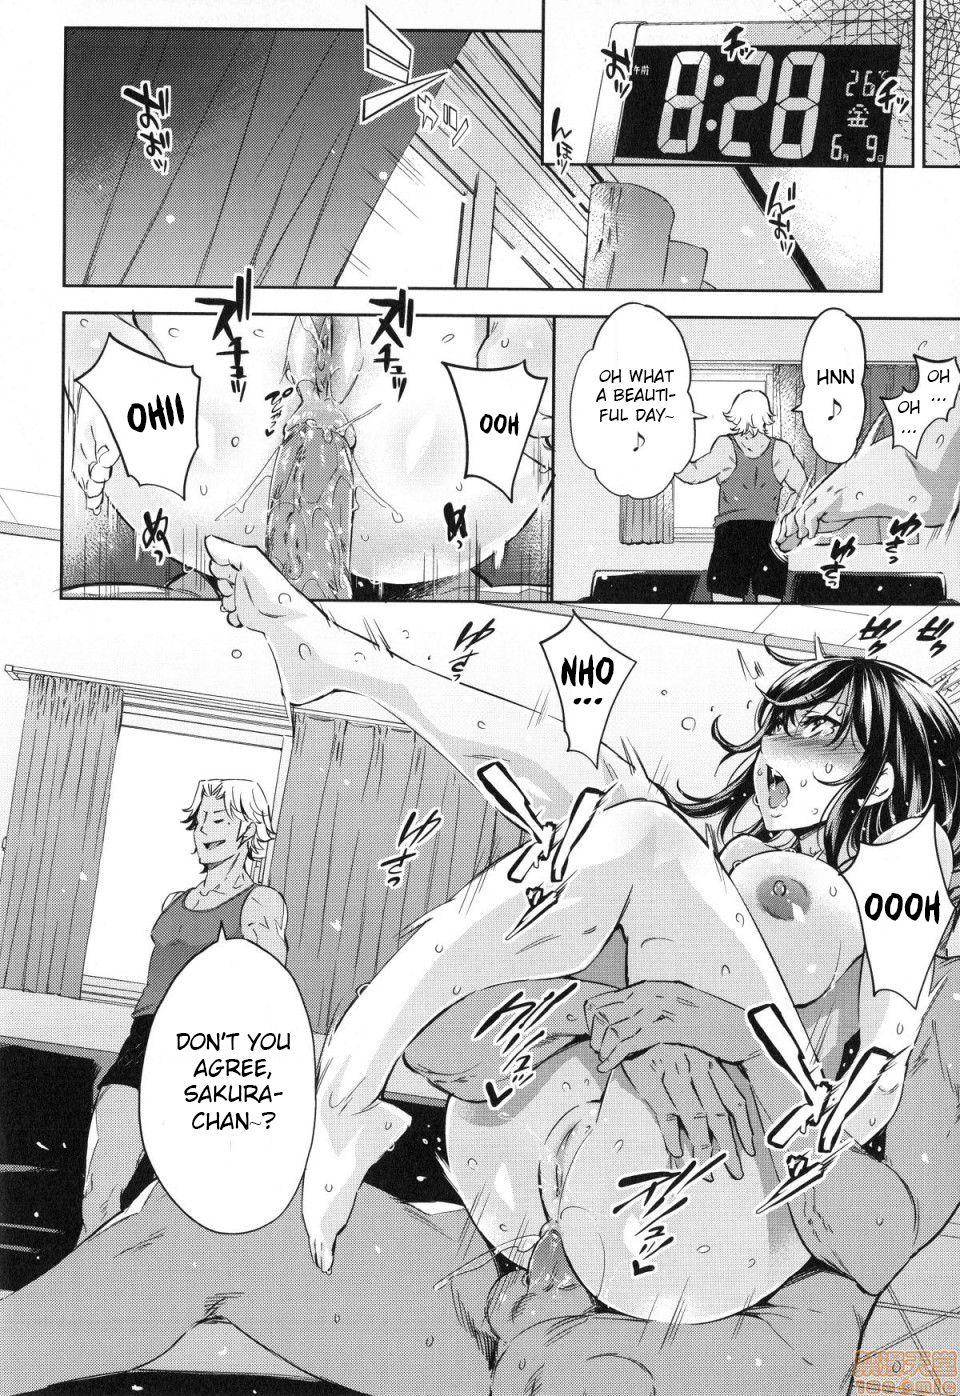 [Musenmai] Gyaru-oh Chinchin ni Katenakatta Kanojo | The Girl Who Couldn't Win Against The Gyaru-oh Dick (Ochinchin ni Makete shimatta Onnanoko-tachi) [English] [Decensored] 15